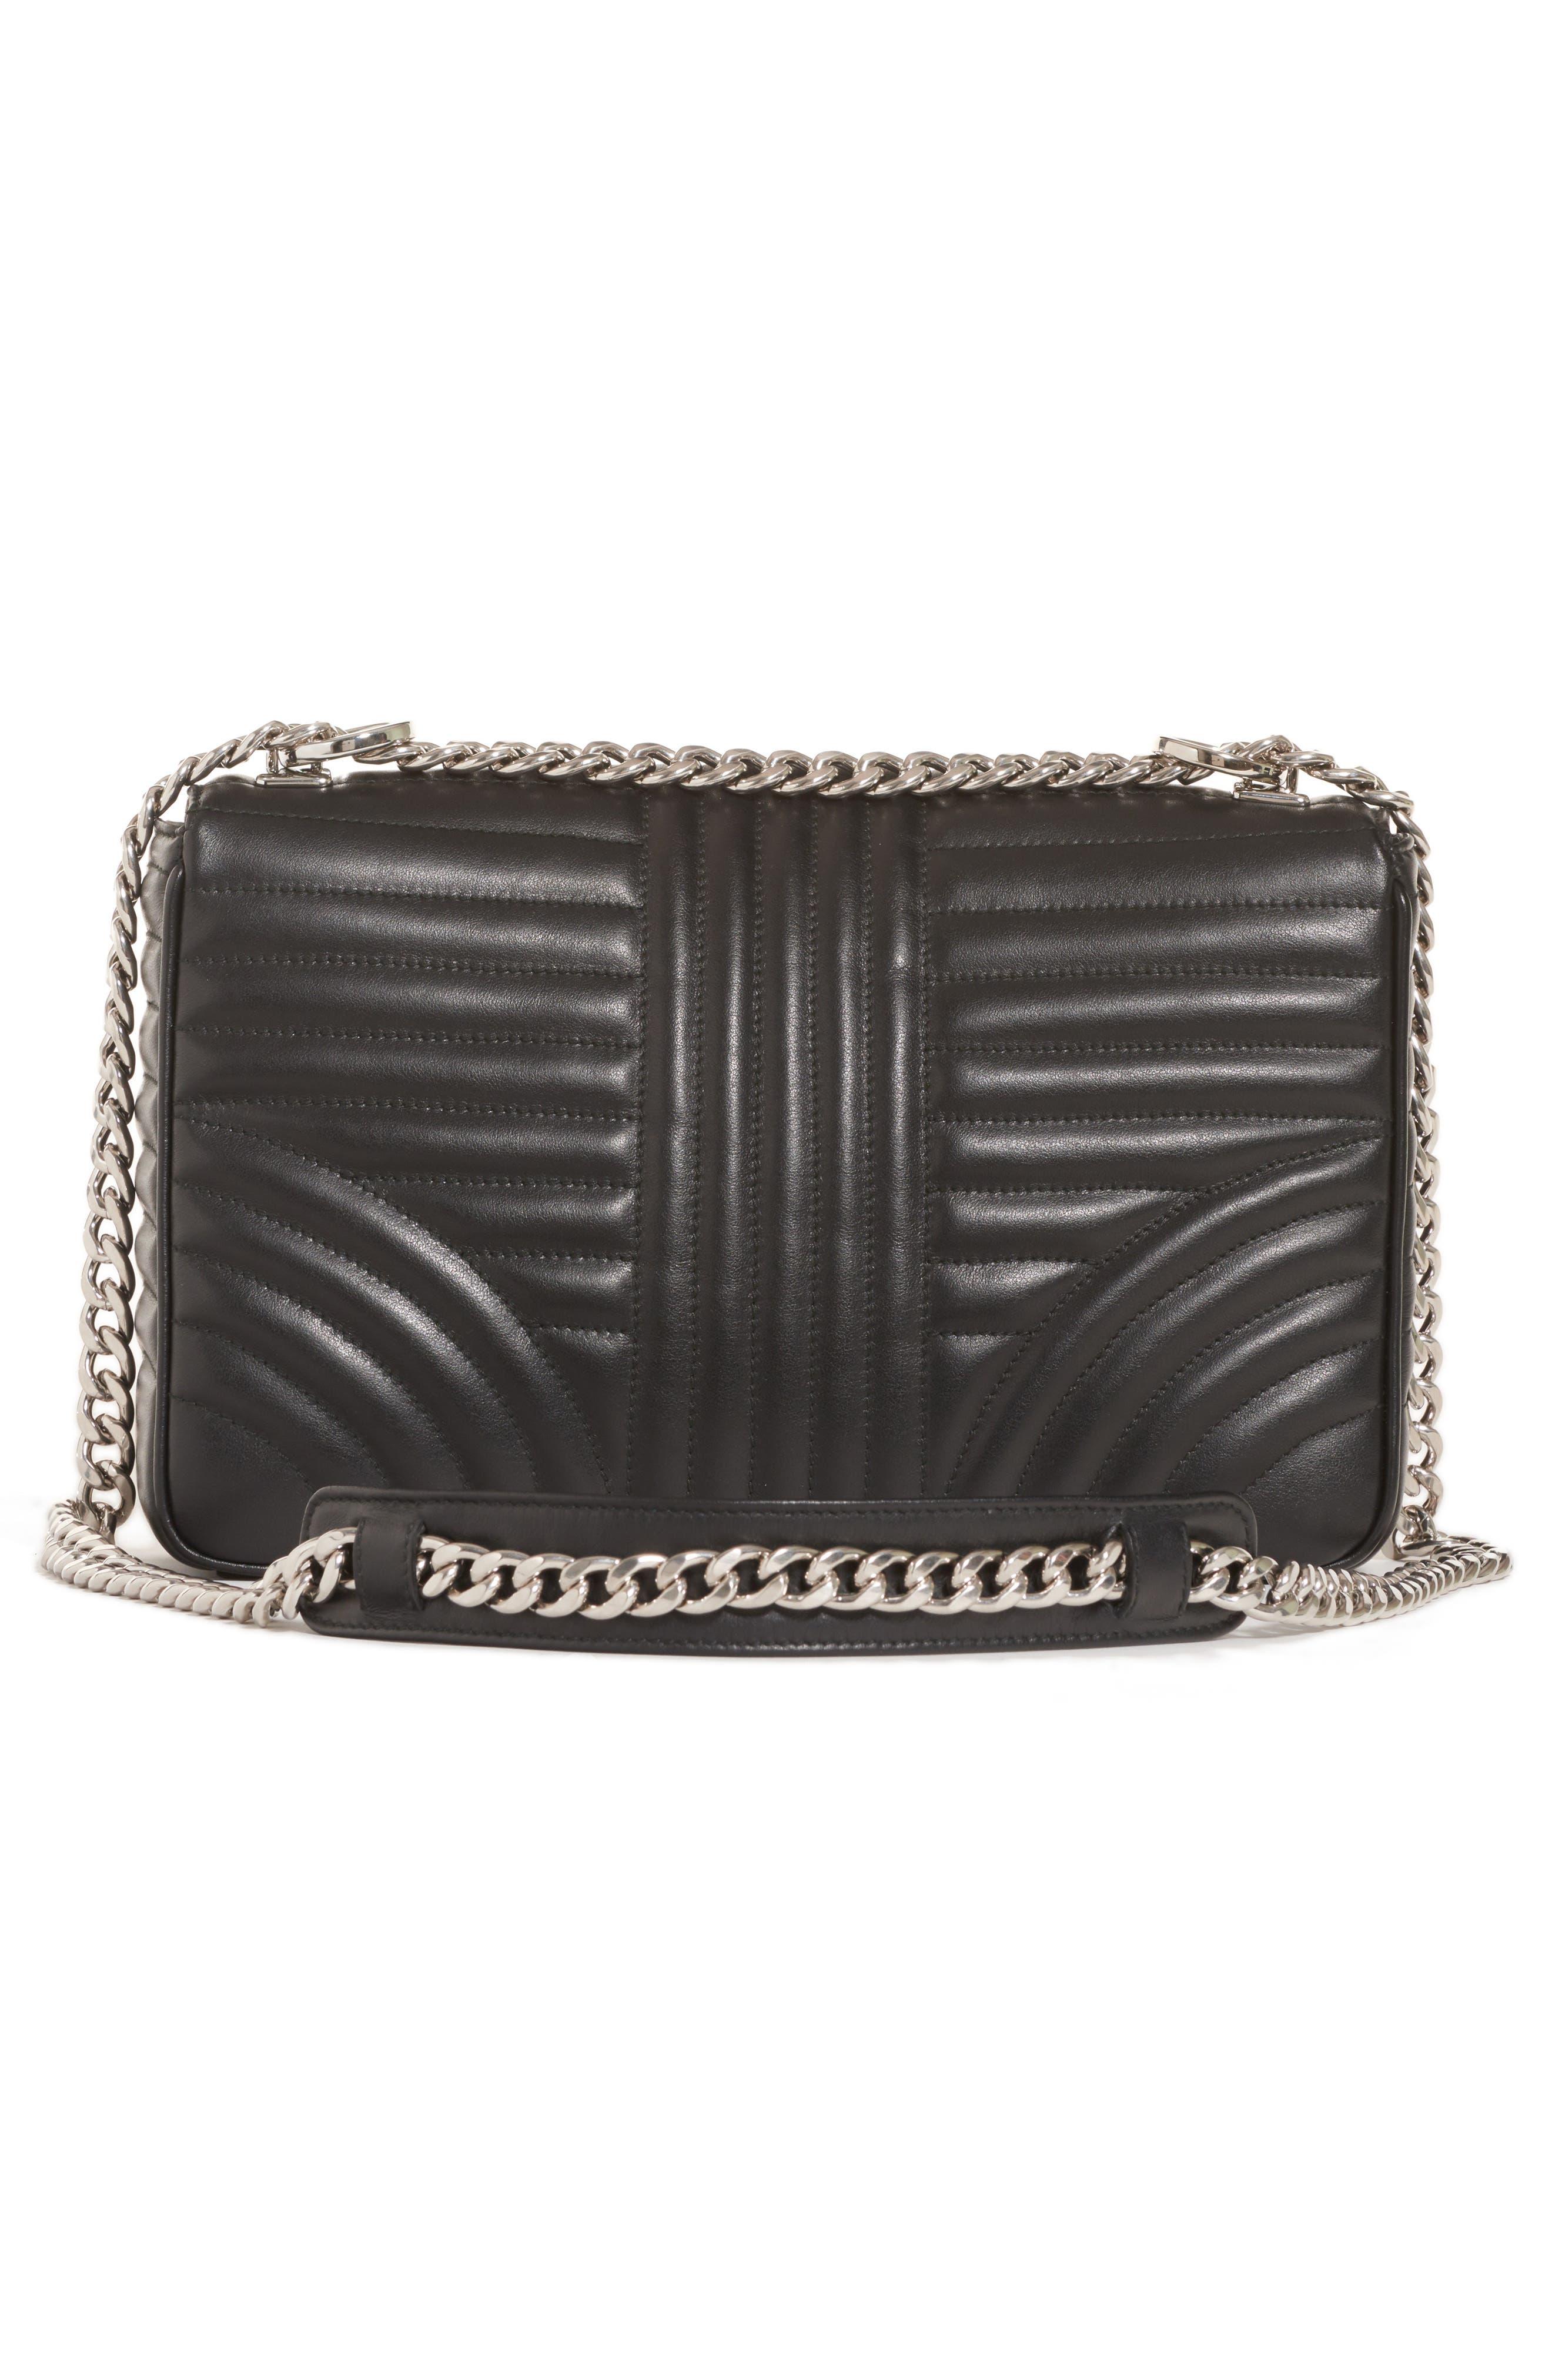 Large Quilted Leather Shoulder Bag,                             Alternate thumbnail 2, color,                             NERO